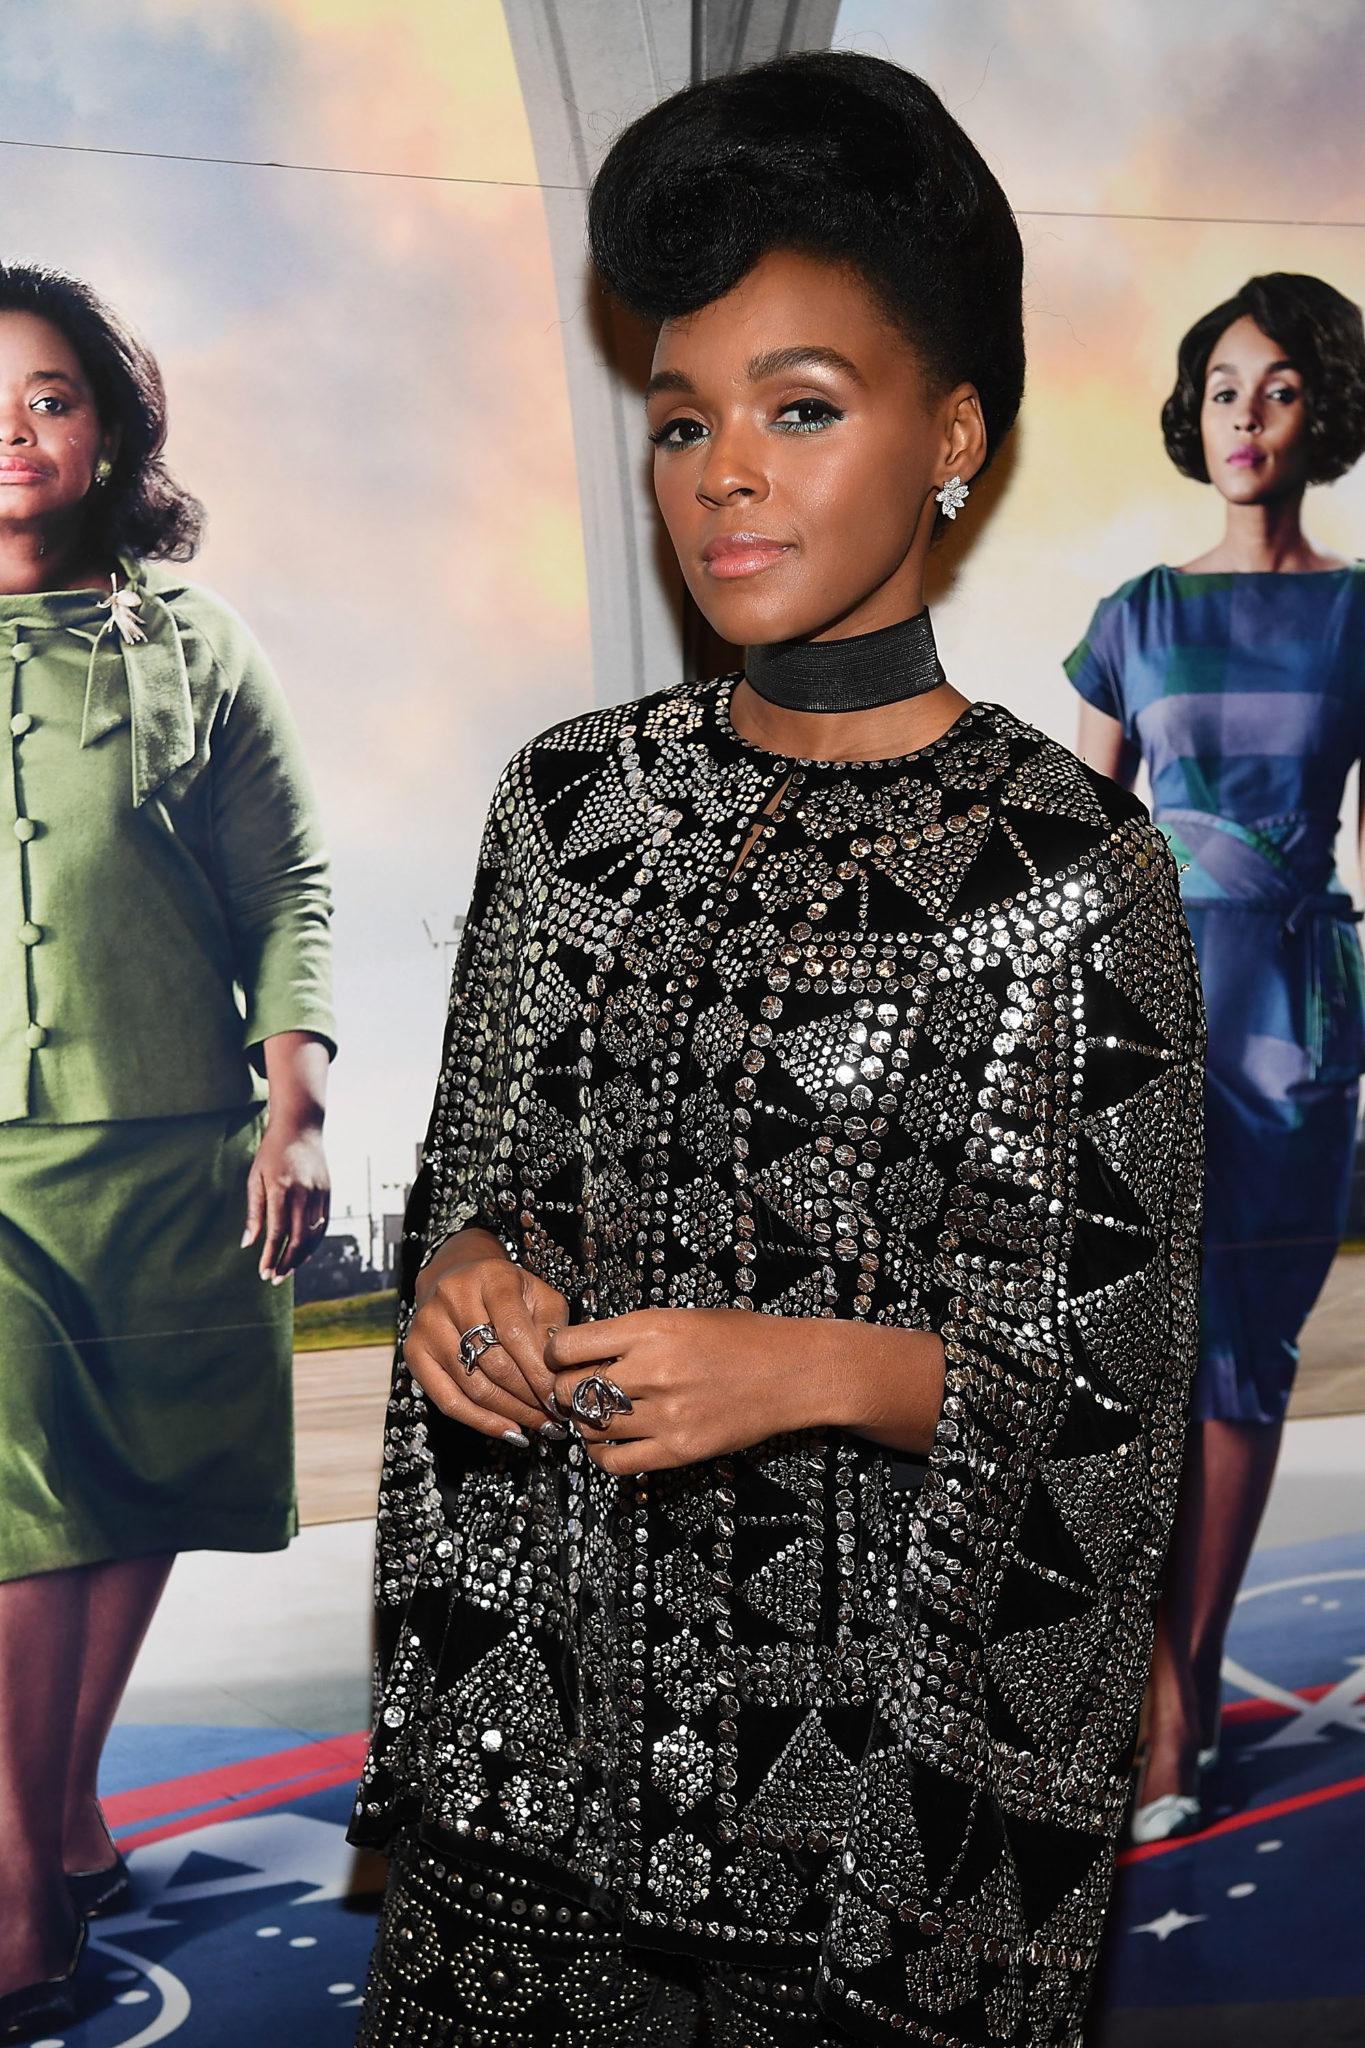 """HIDDEN FIGURES"" Screening Hosted by Janelle Monae & Pharrell Williams at Regal Atlantic Station"